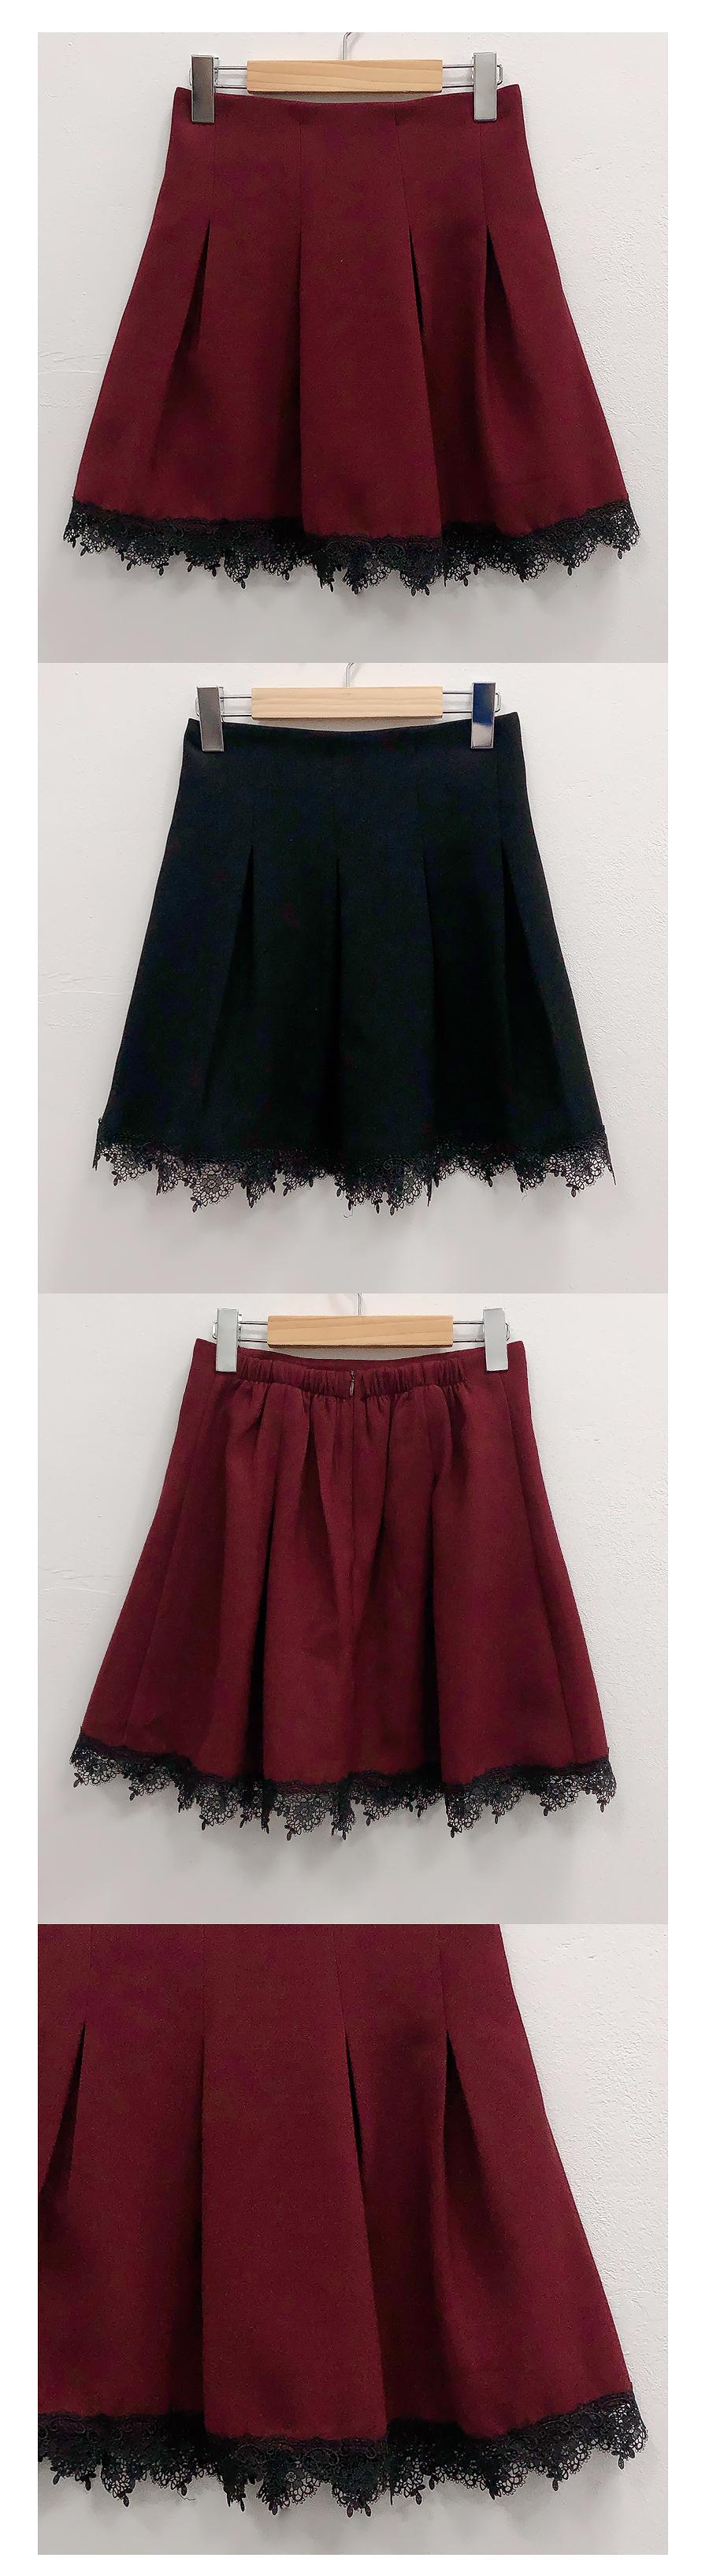 Charo Lace Skirt Pants